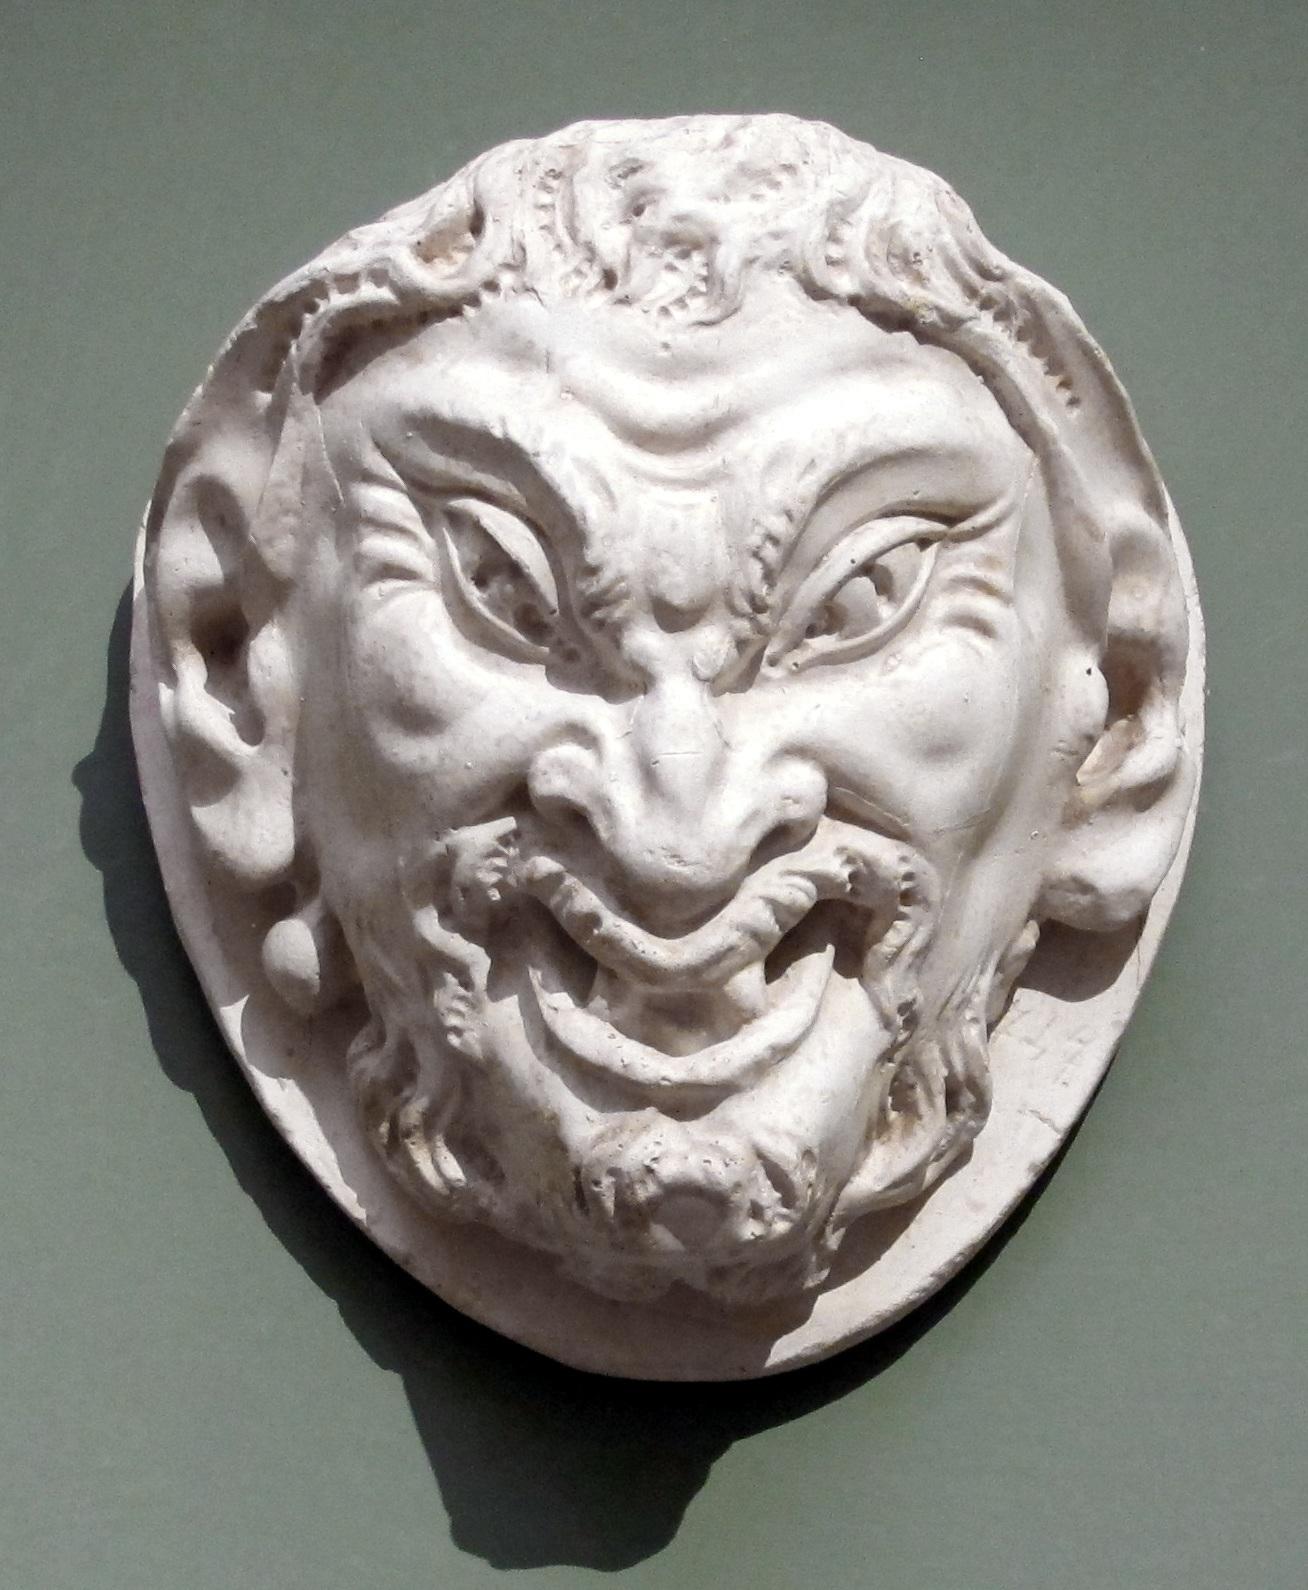 Maska fauna Michal Aniol, Uffizi